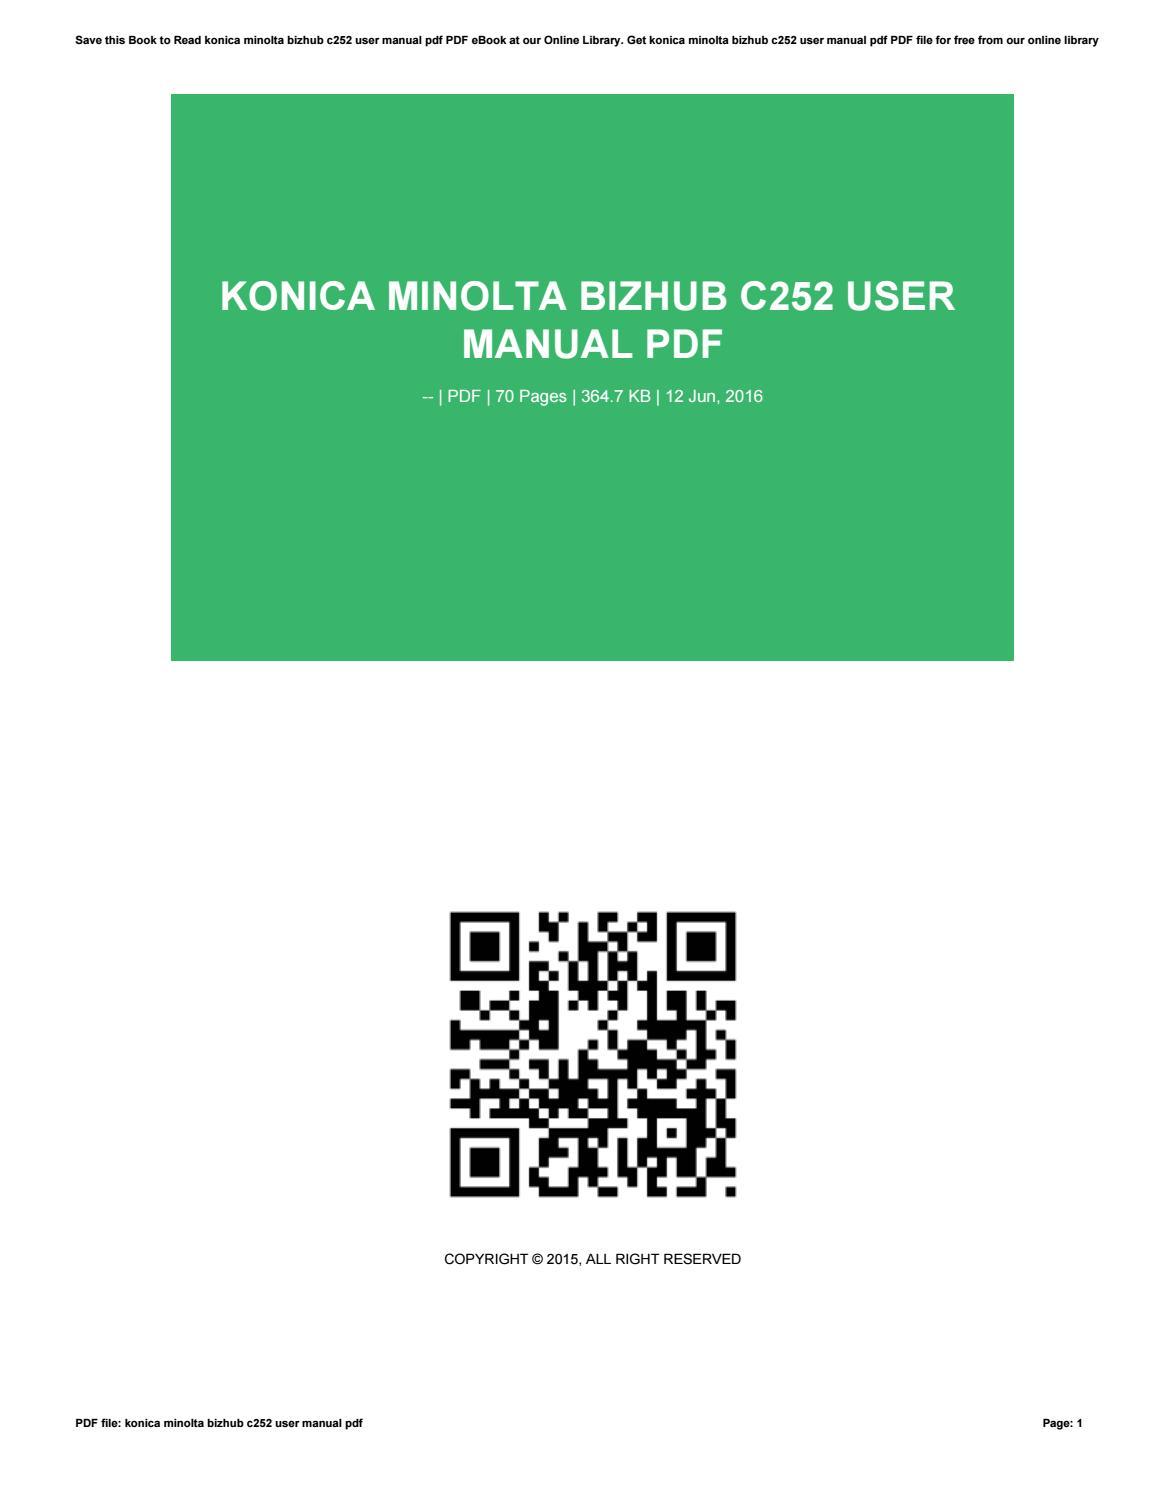 konica minolta bizhub c252 user manual pdf by o661 issuu rh issuu com Bizhub C450 Bizhub C360